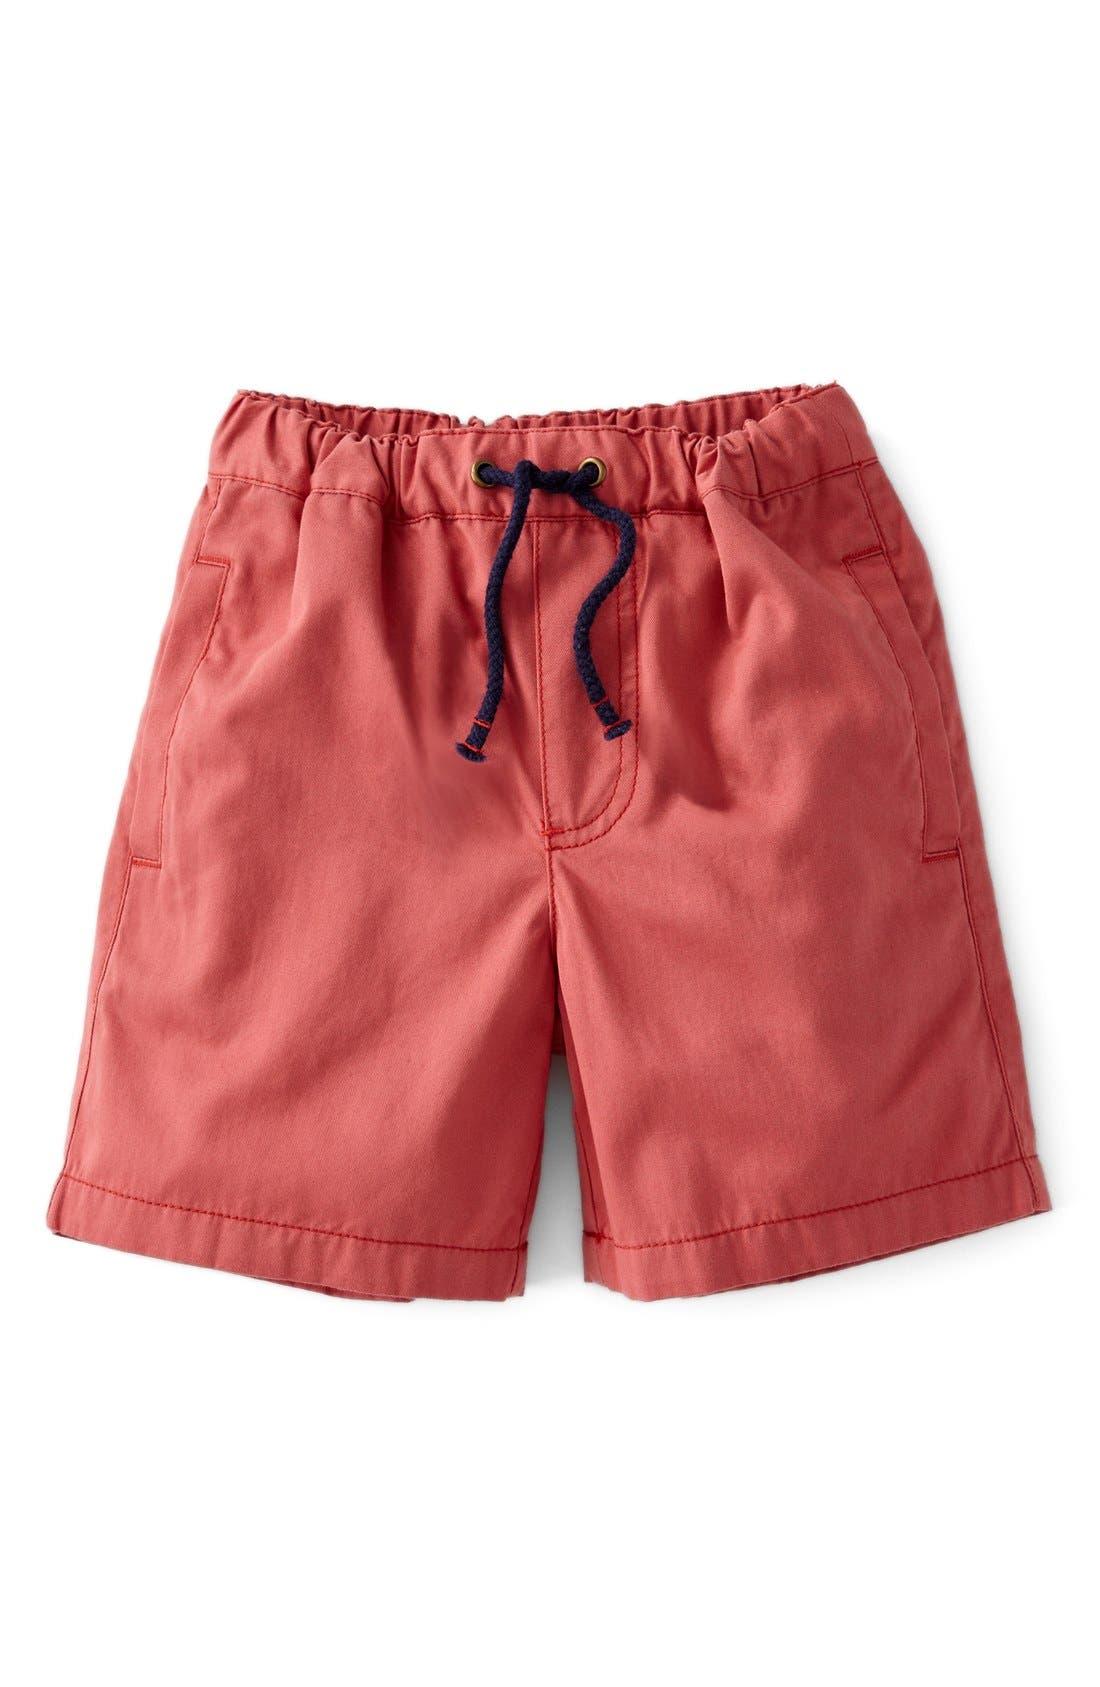 Main Image - Mini Boden Drawstring Shorts (Toddler Boys, Little Boys & Big Boys)